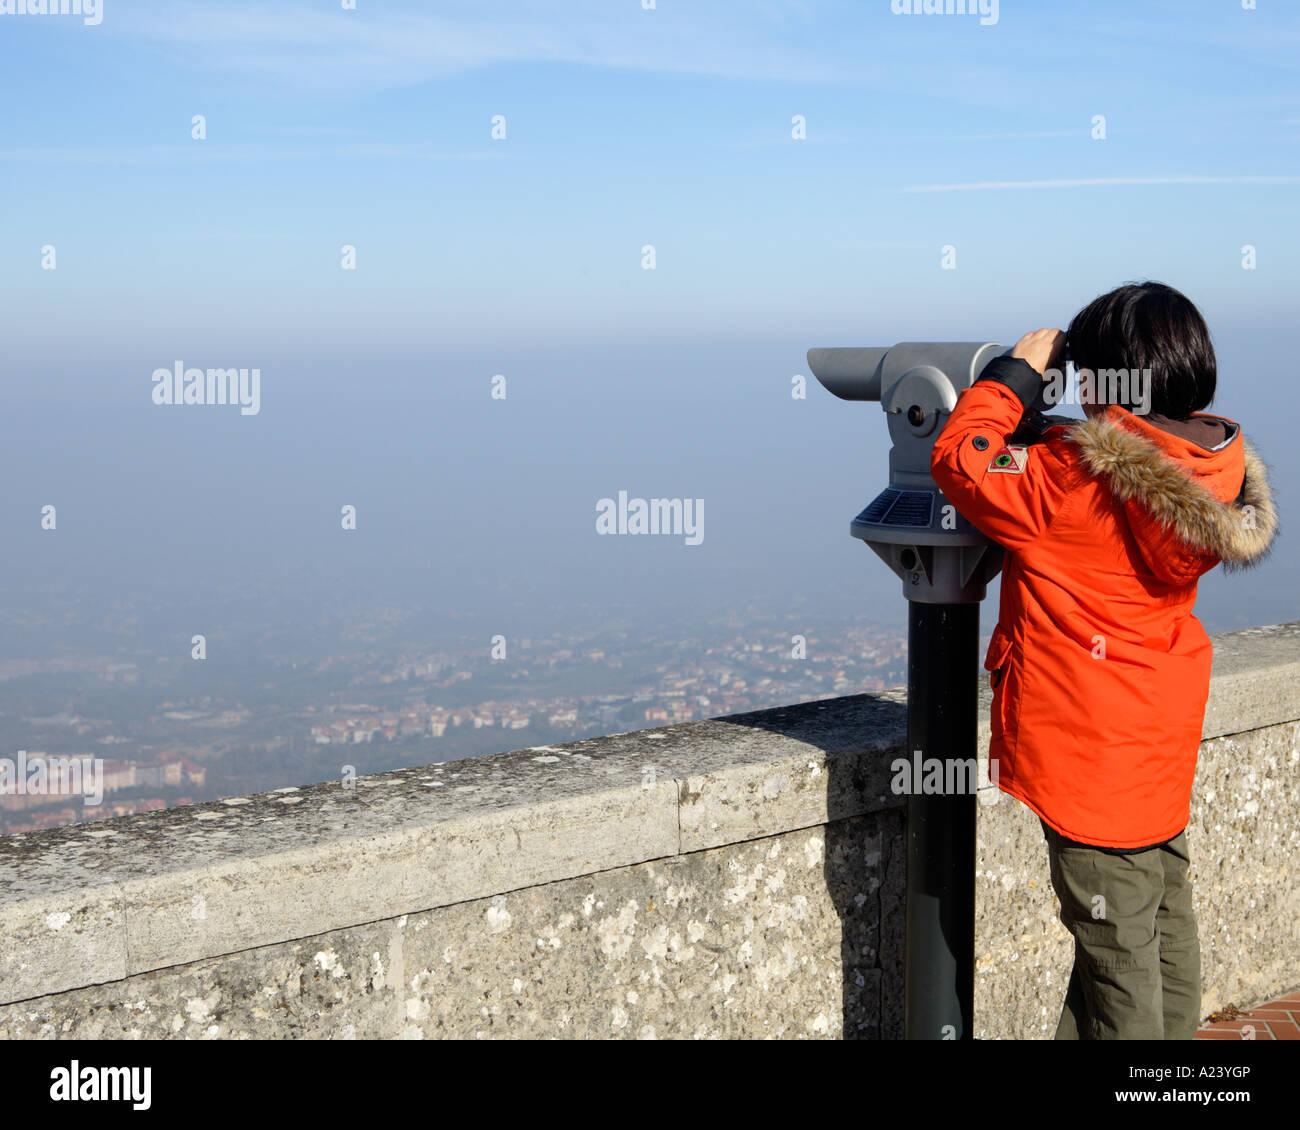 Boy with telescope, San Marino, Emilia-Romagna, Italy. - Stock Image